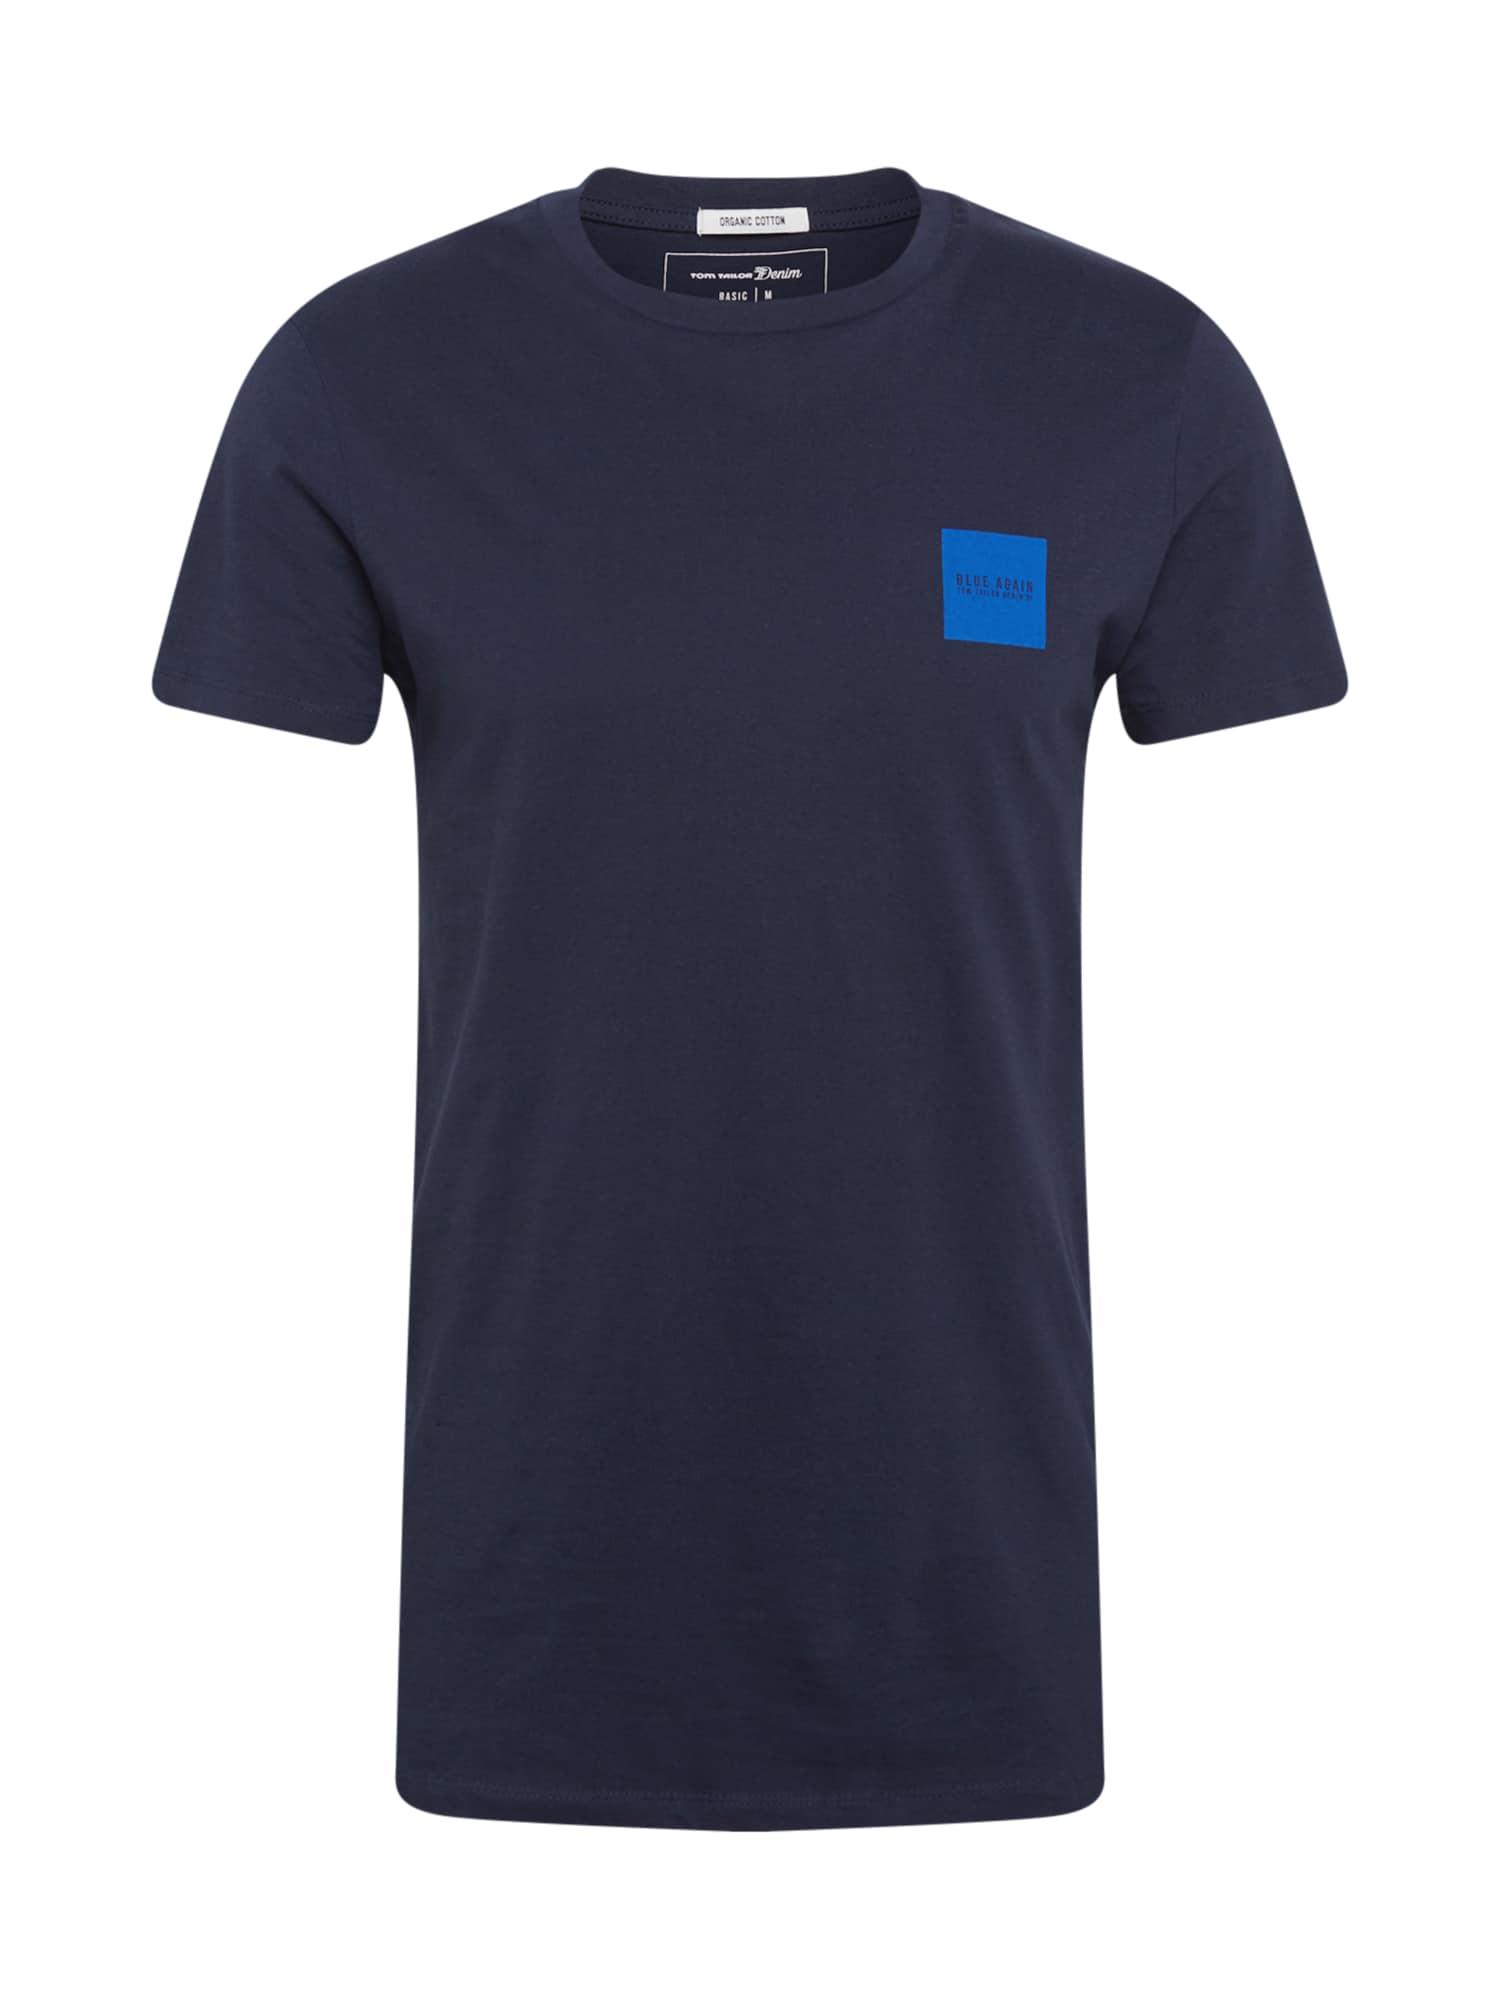 TOM TAILOR DENIM Tričko  tmavě modrá